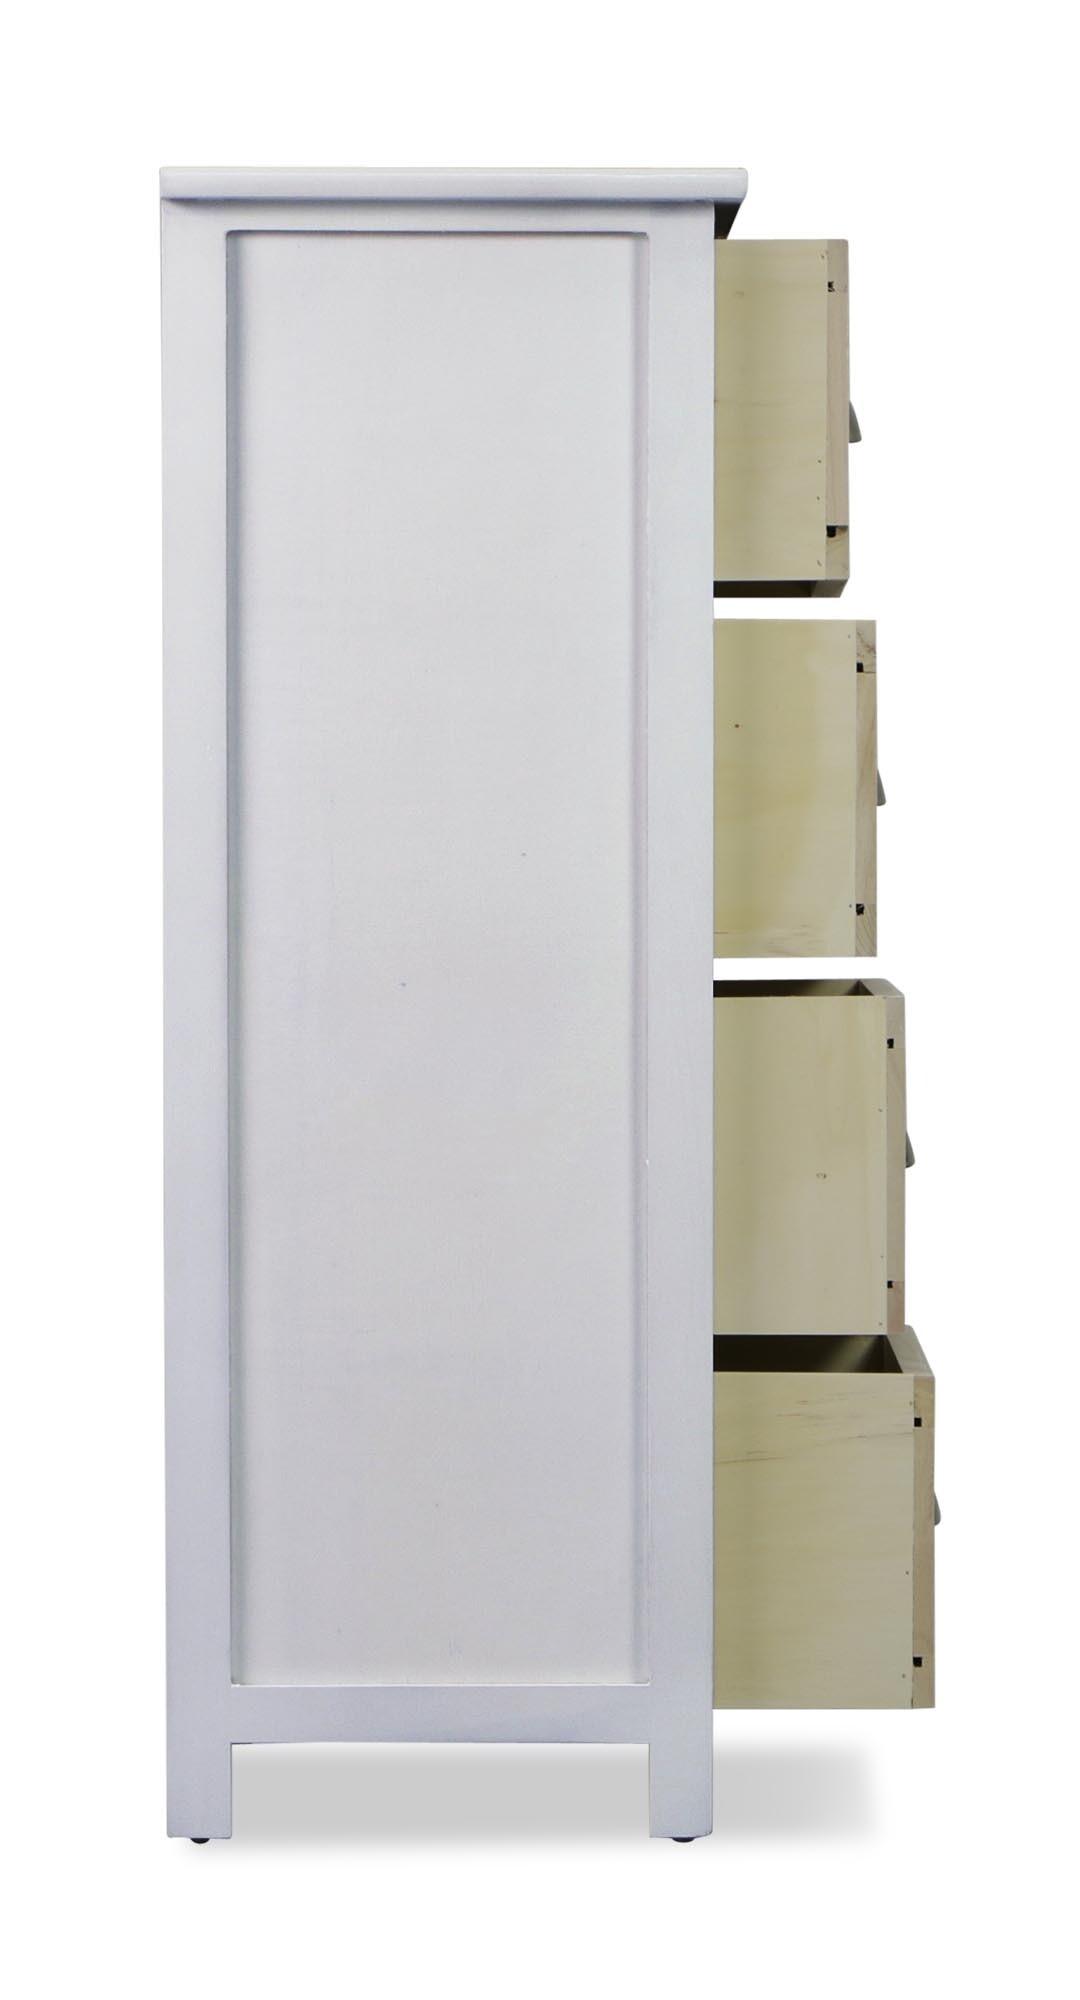 Superieur Clover 4 Drawer Storage Unit. Display Gallery Item 1; Display Gallery Item  2 ...